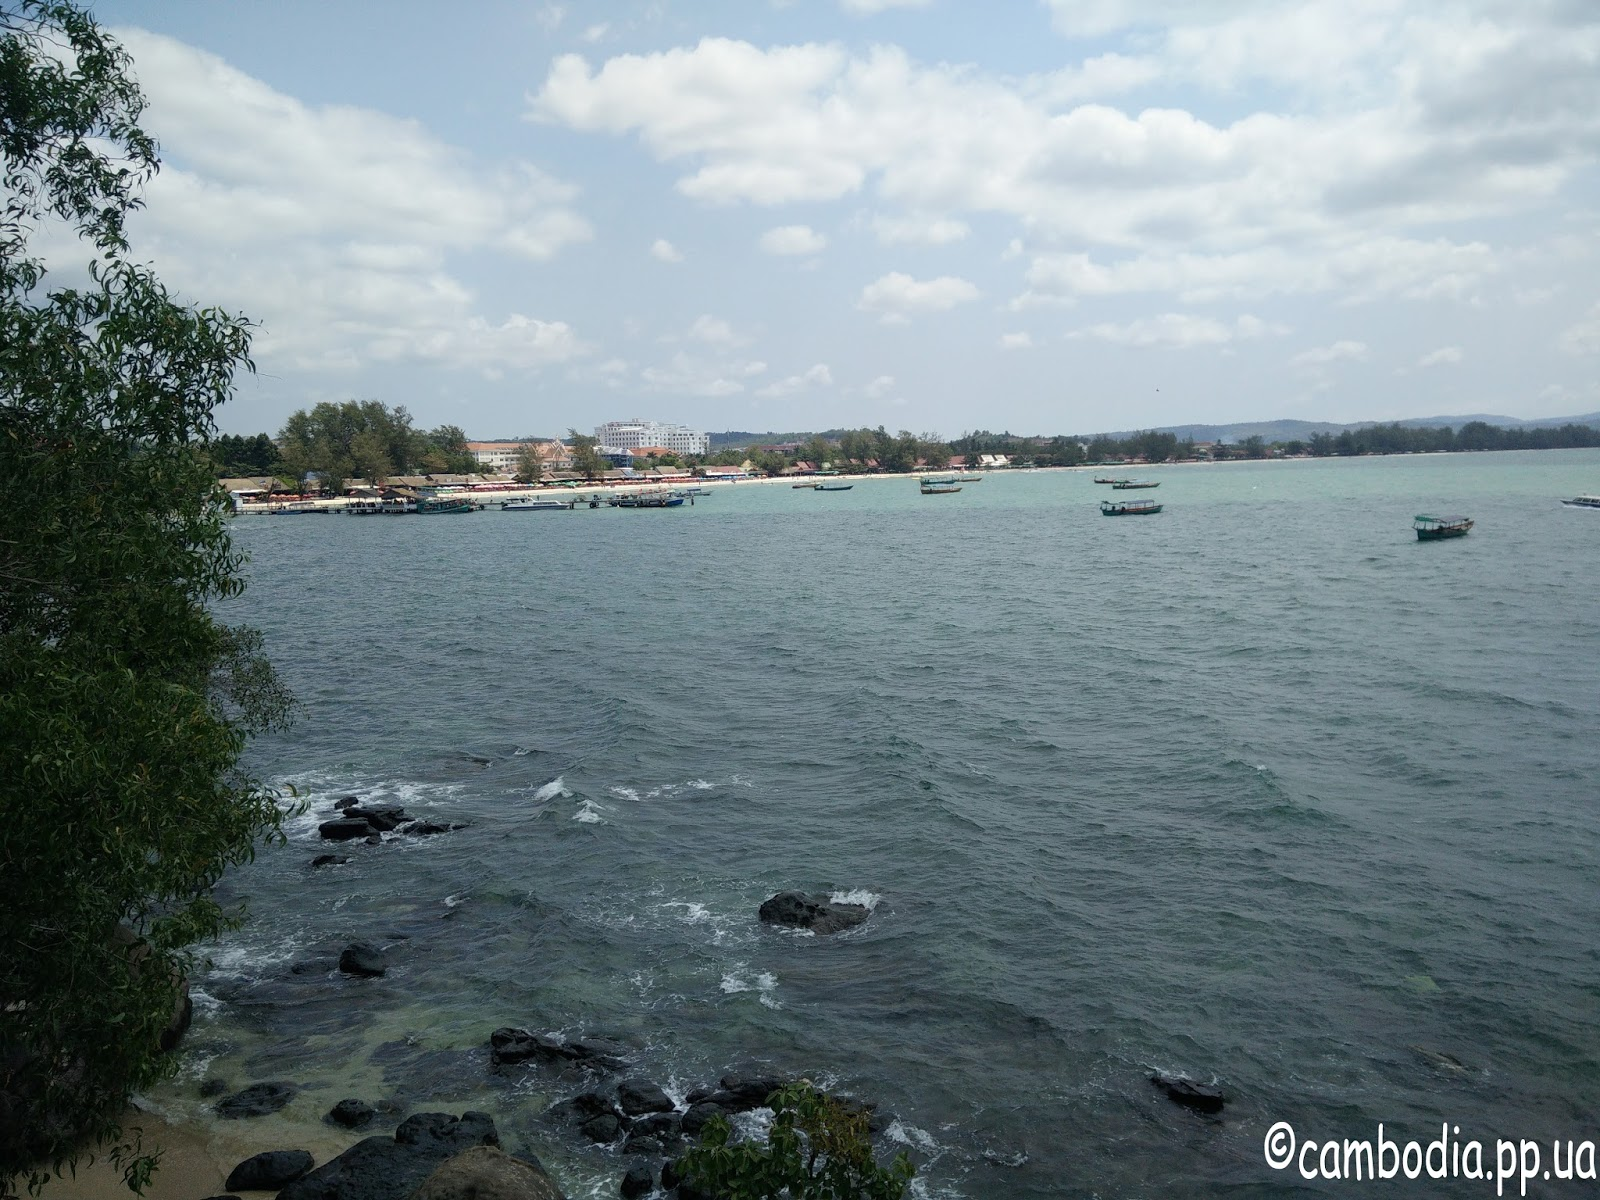 Рыбацкие лодки в Камбодже